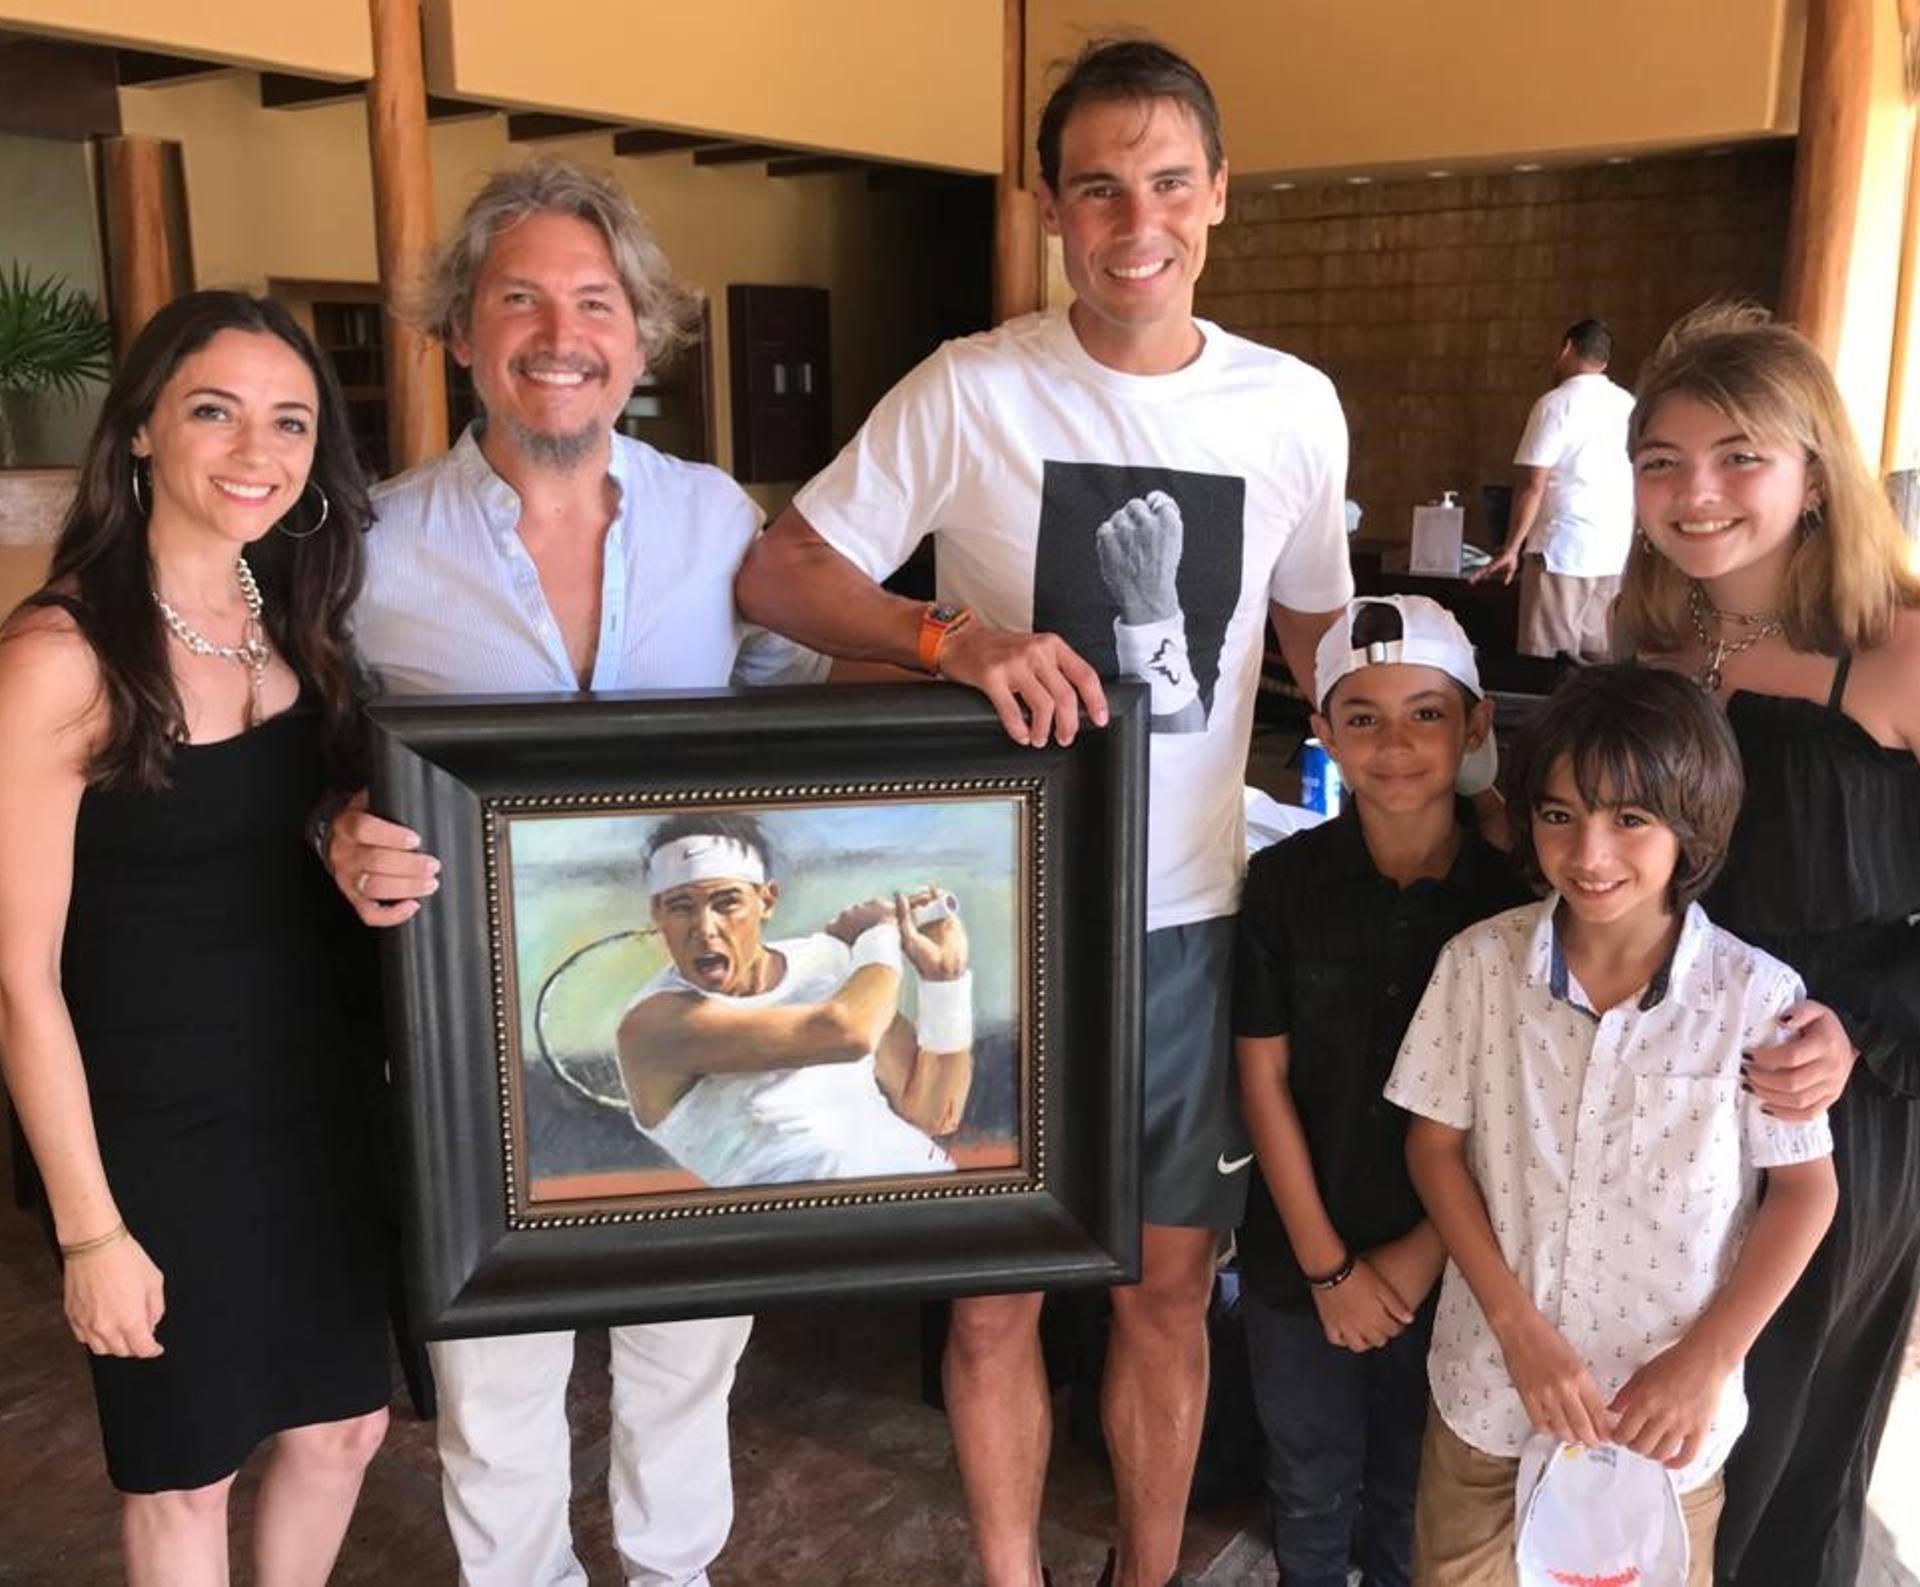 Rafael Nadal holding portrait next to Fabian Perez and family